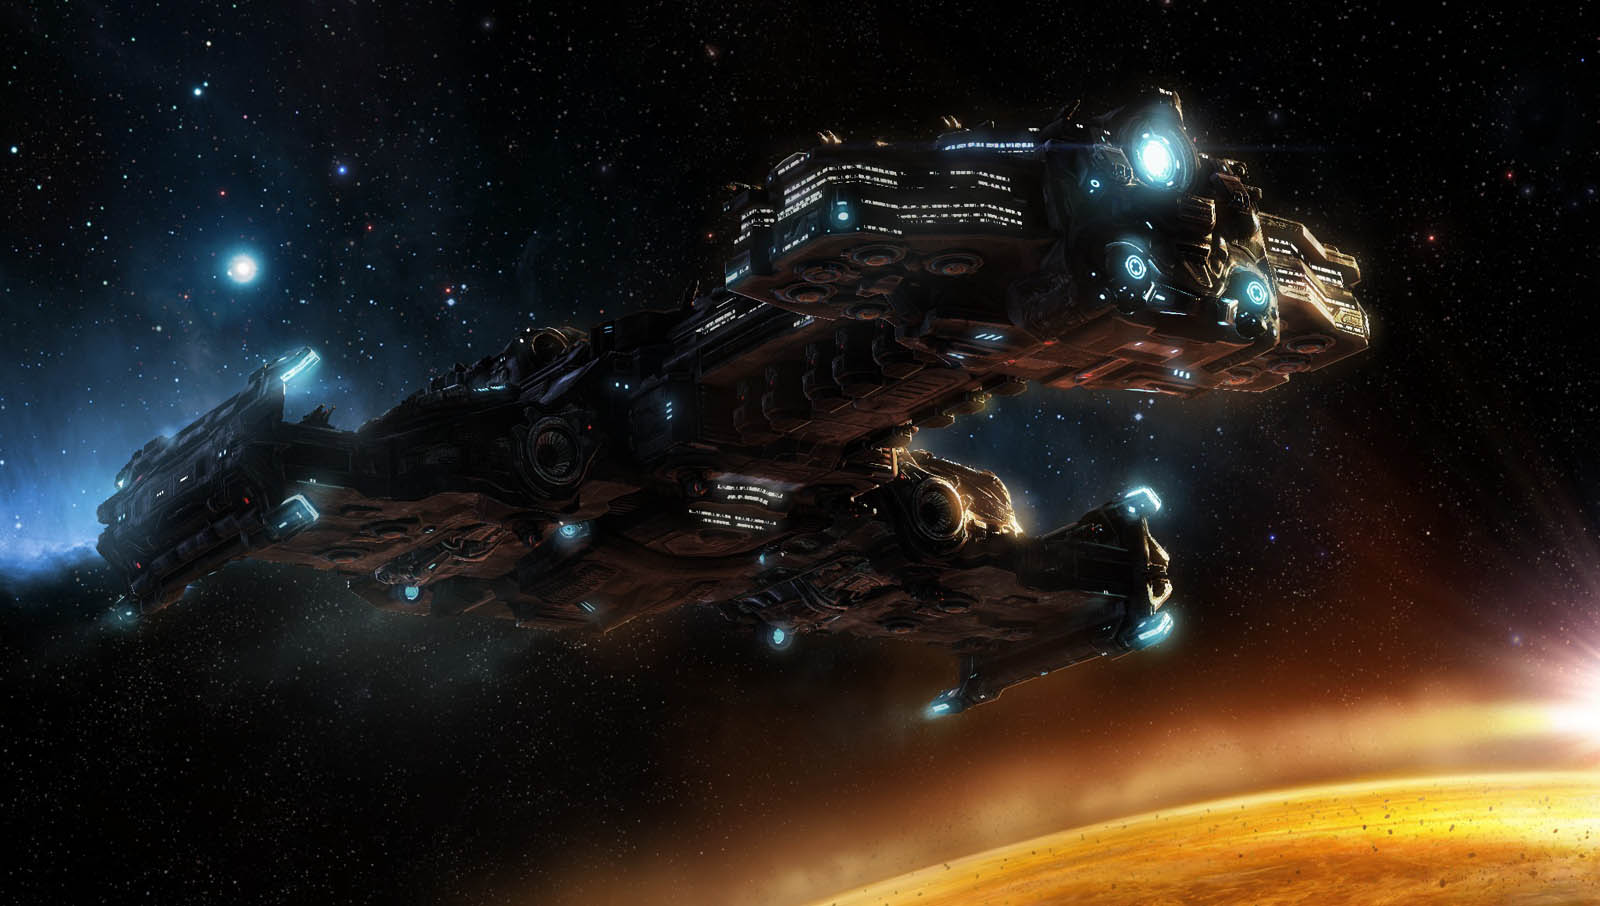 Artwork - Media - StarCraft II